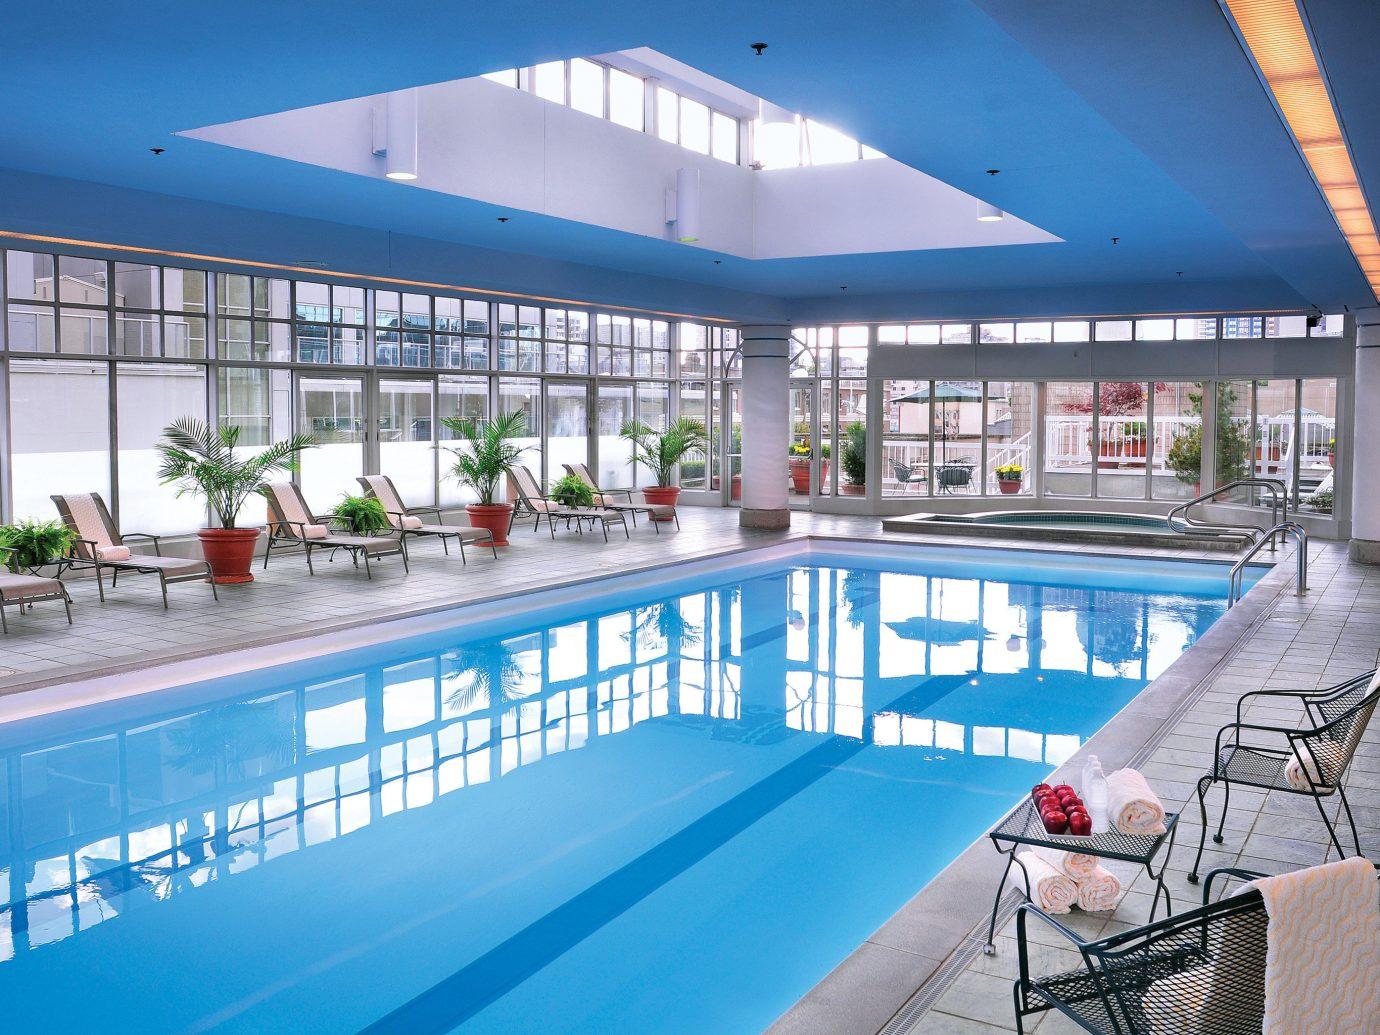 Hip Hotels Lounge Luxury Pool Scenic views building leisure swimming pool property Resort leisure centre condominium estate real estate Deck